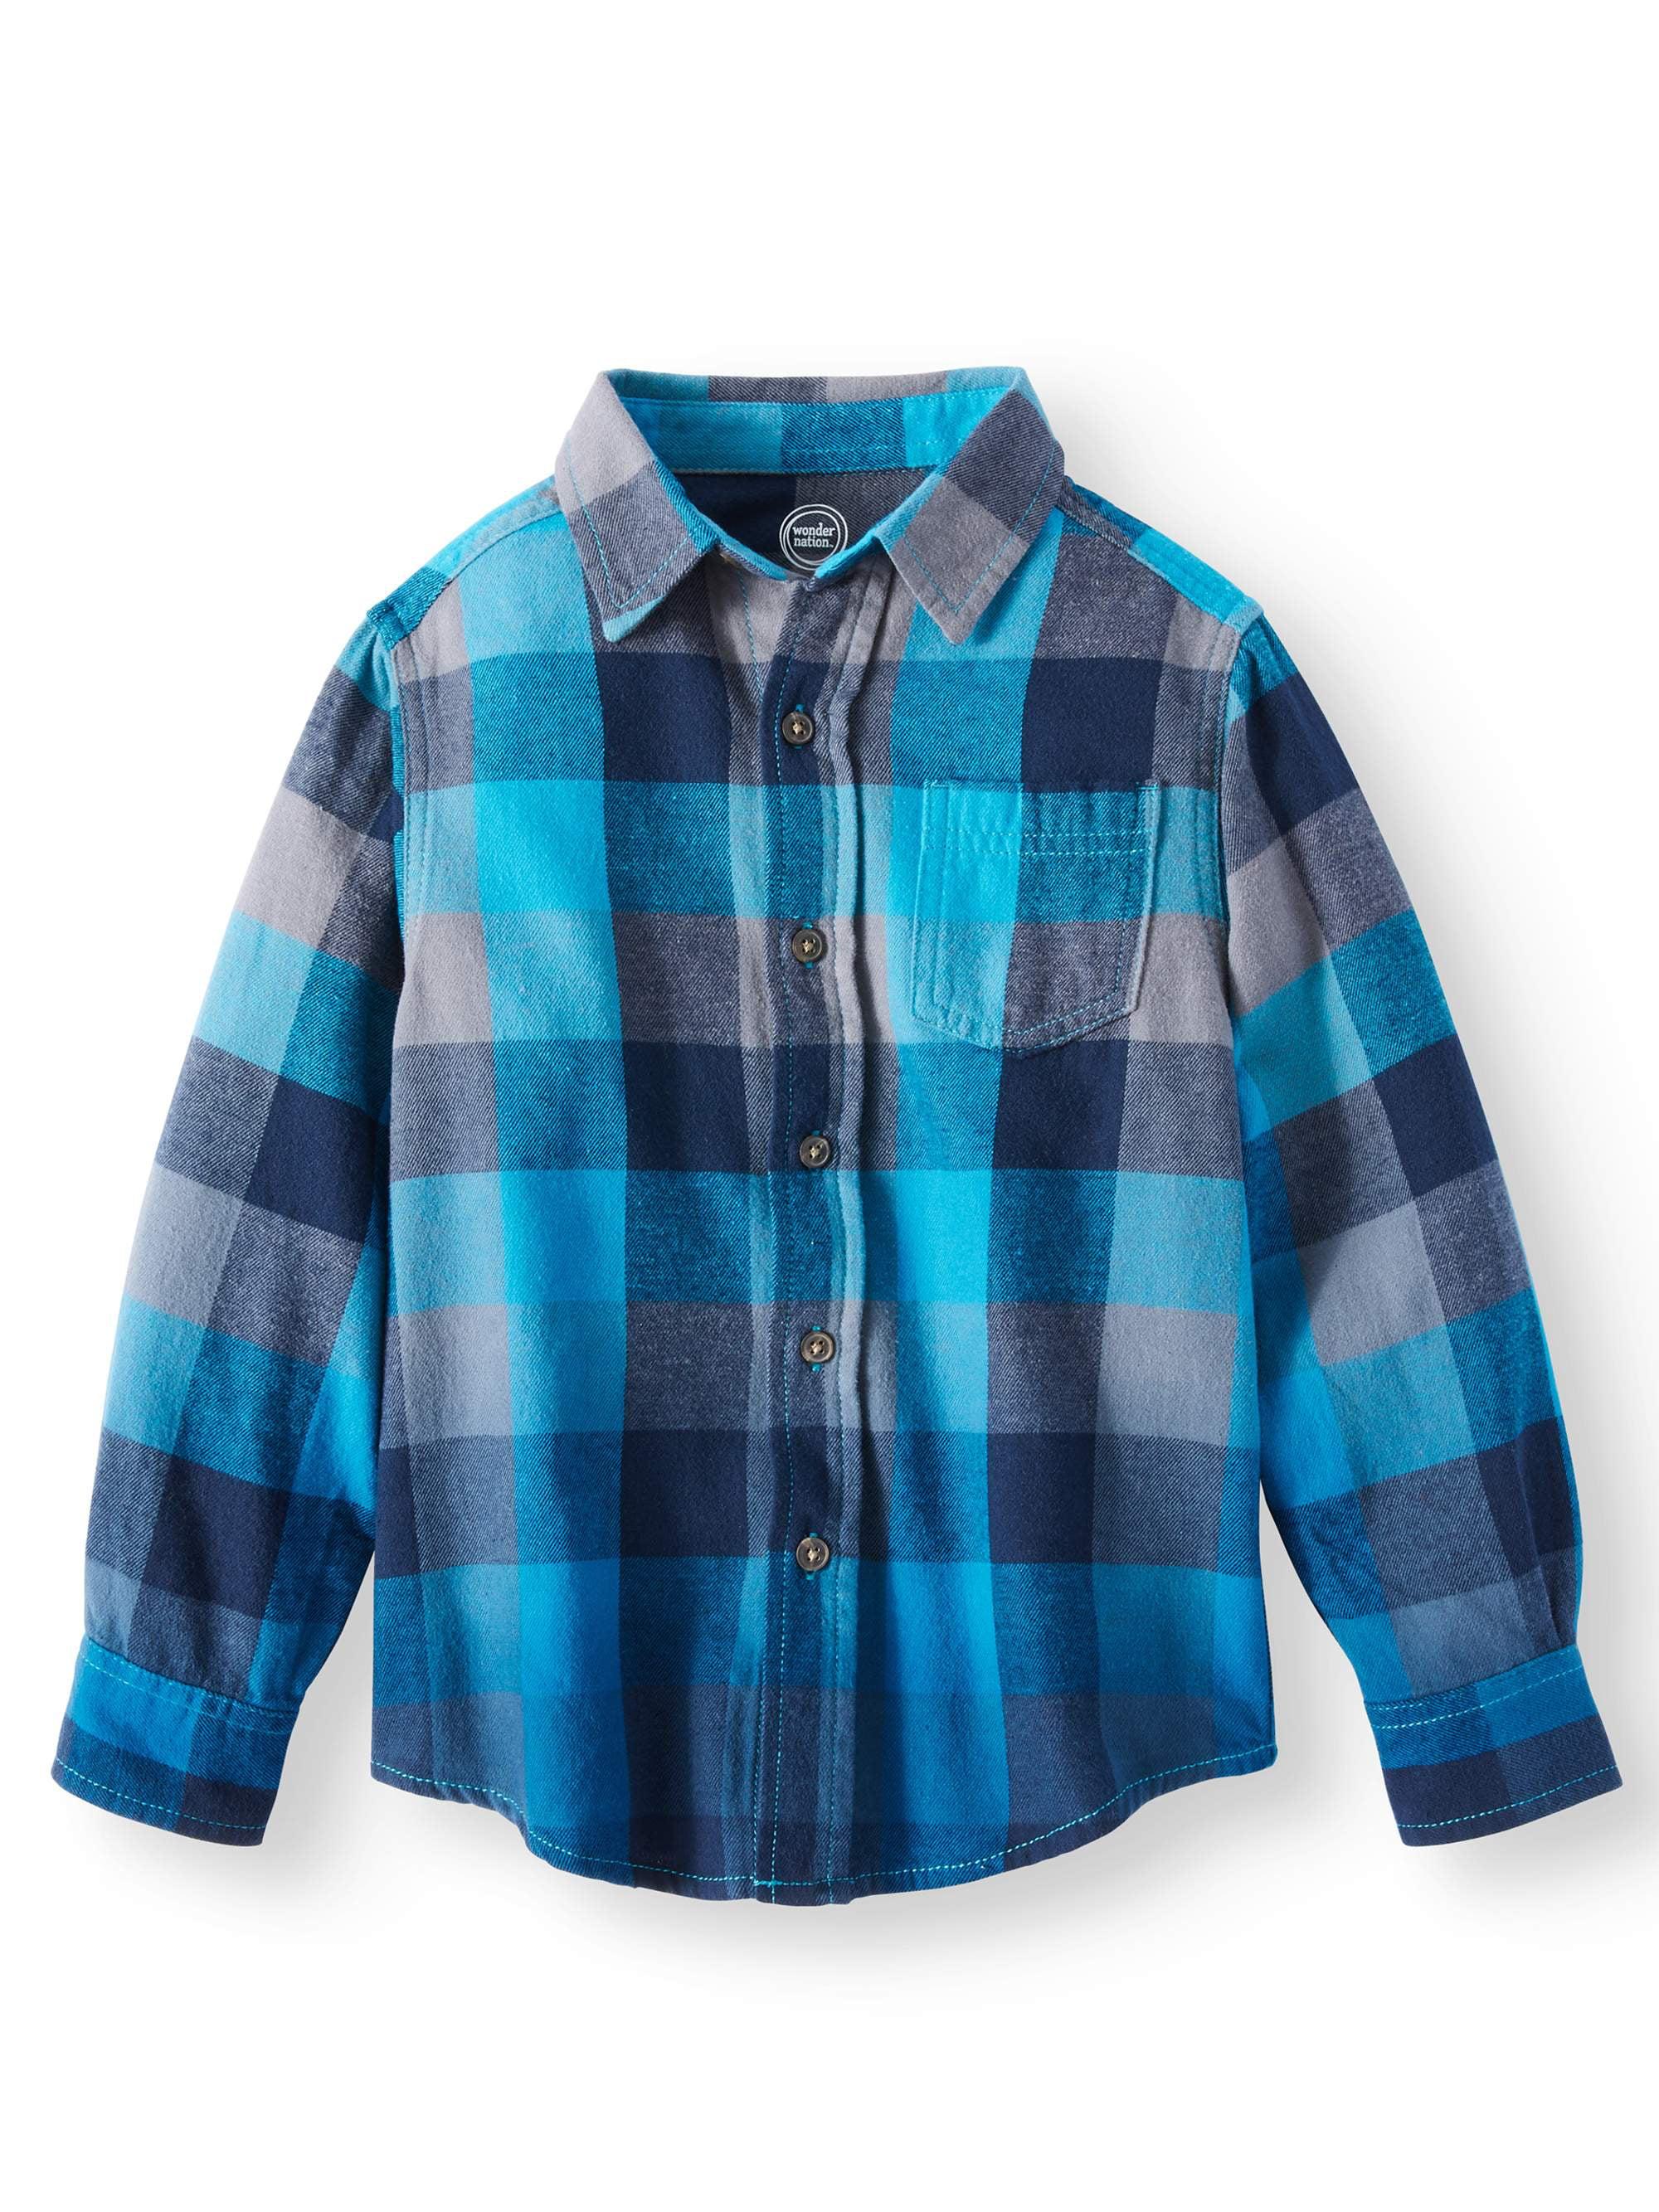 08ee796f4 Wonder Nation - Wonder Nation Long Sleeve Flannel Shirt (Little Boys & Big  Boys) - Walmart.com